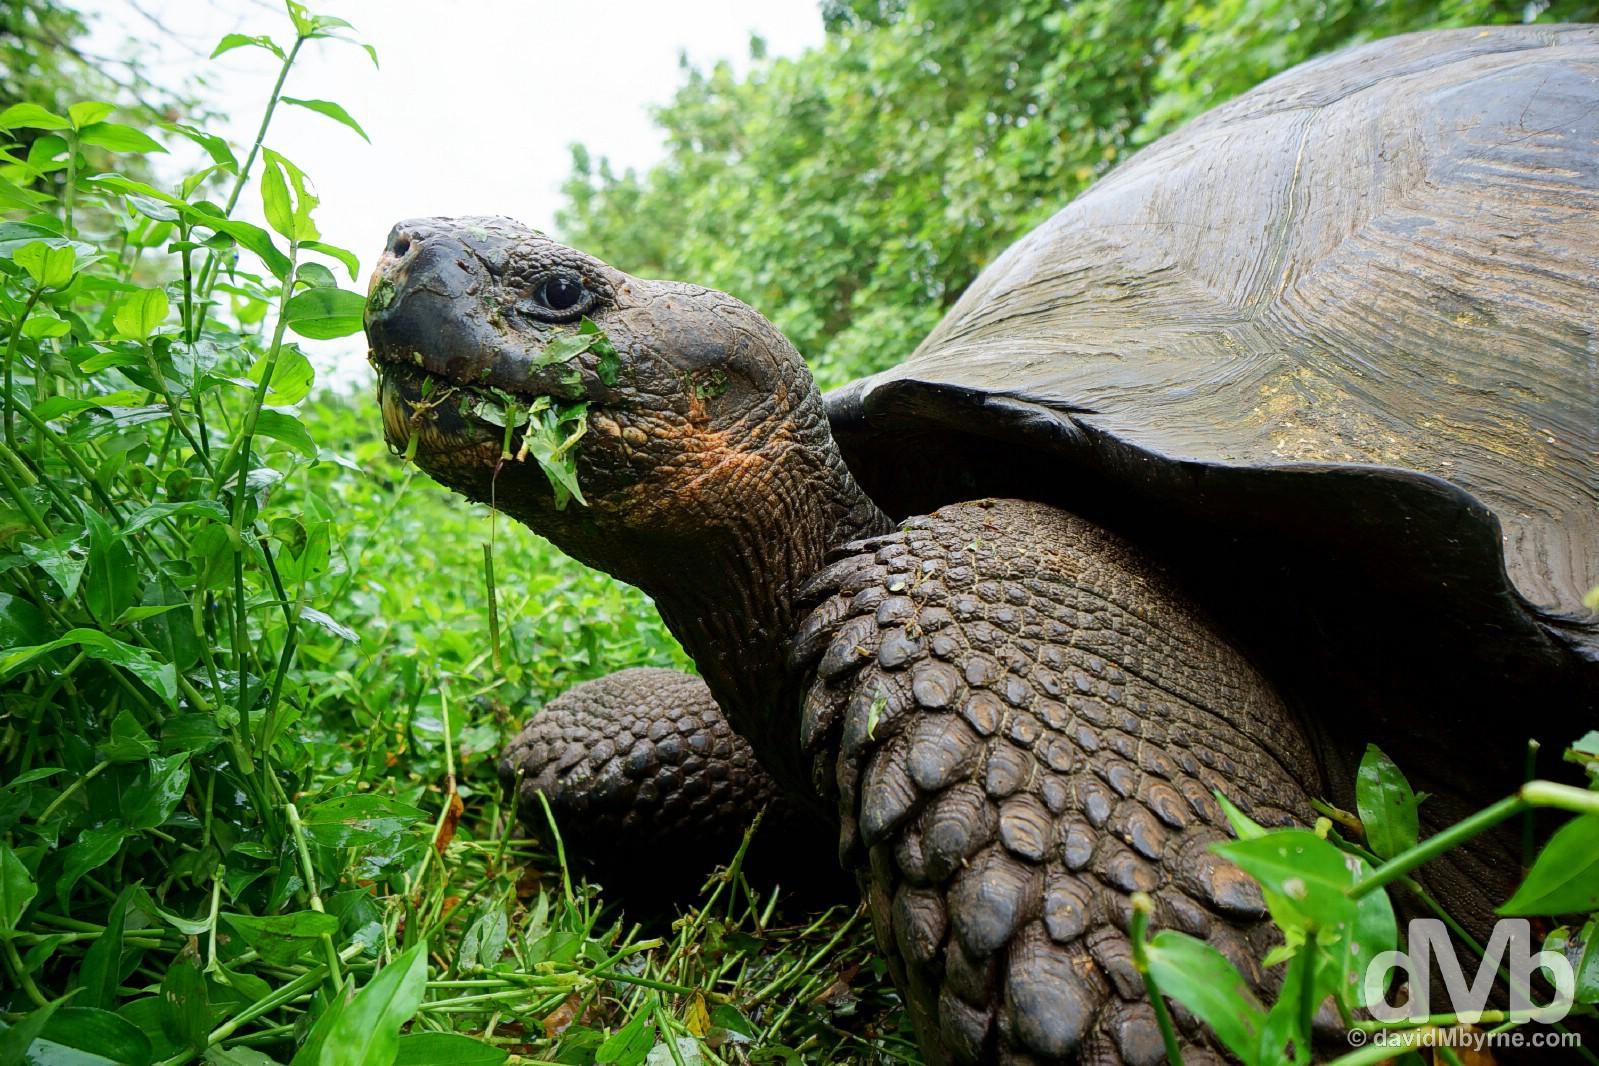 A Giant Tortoise feeding. Rancho Primicias, Isla Santa Cruz, Galapagos, Ecuador. July 17, 2015.